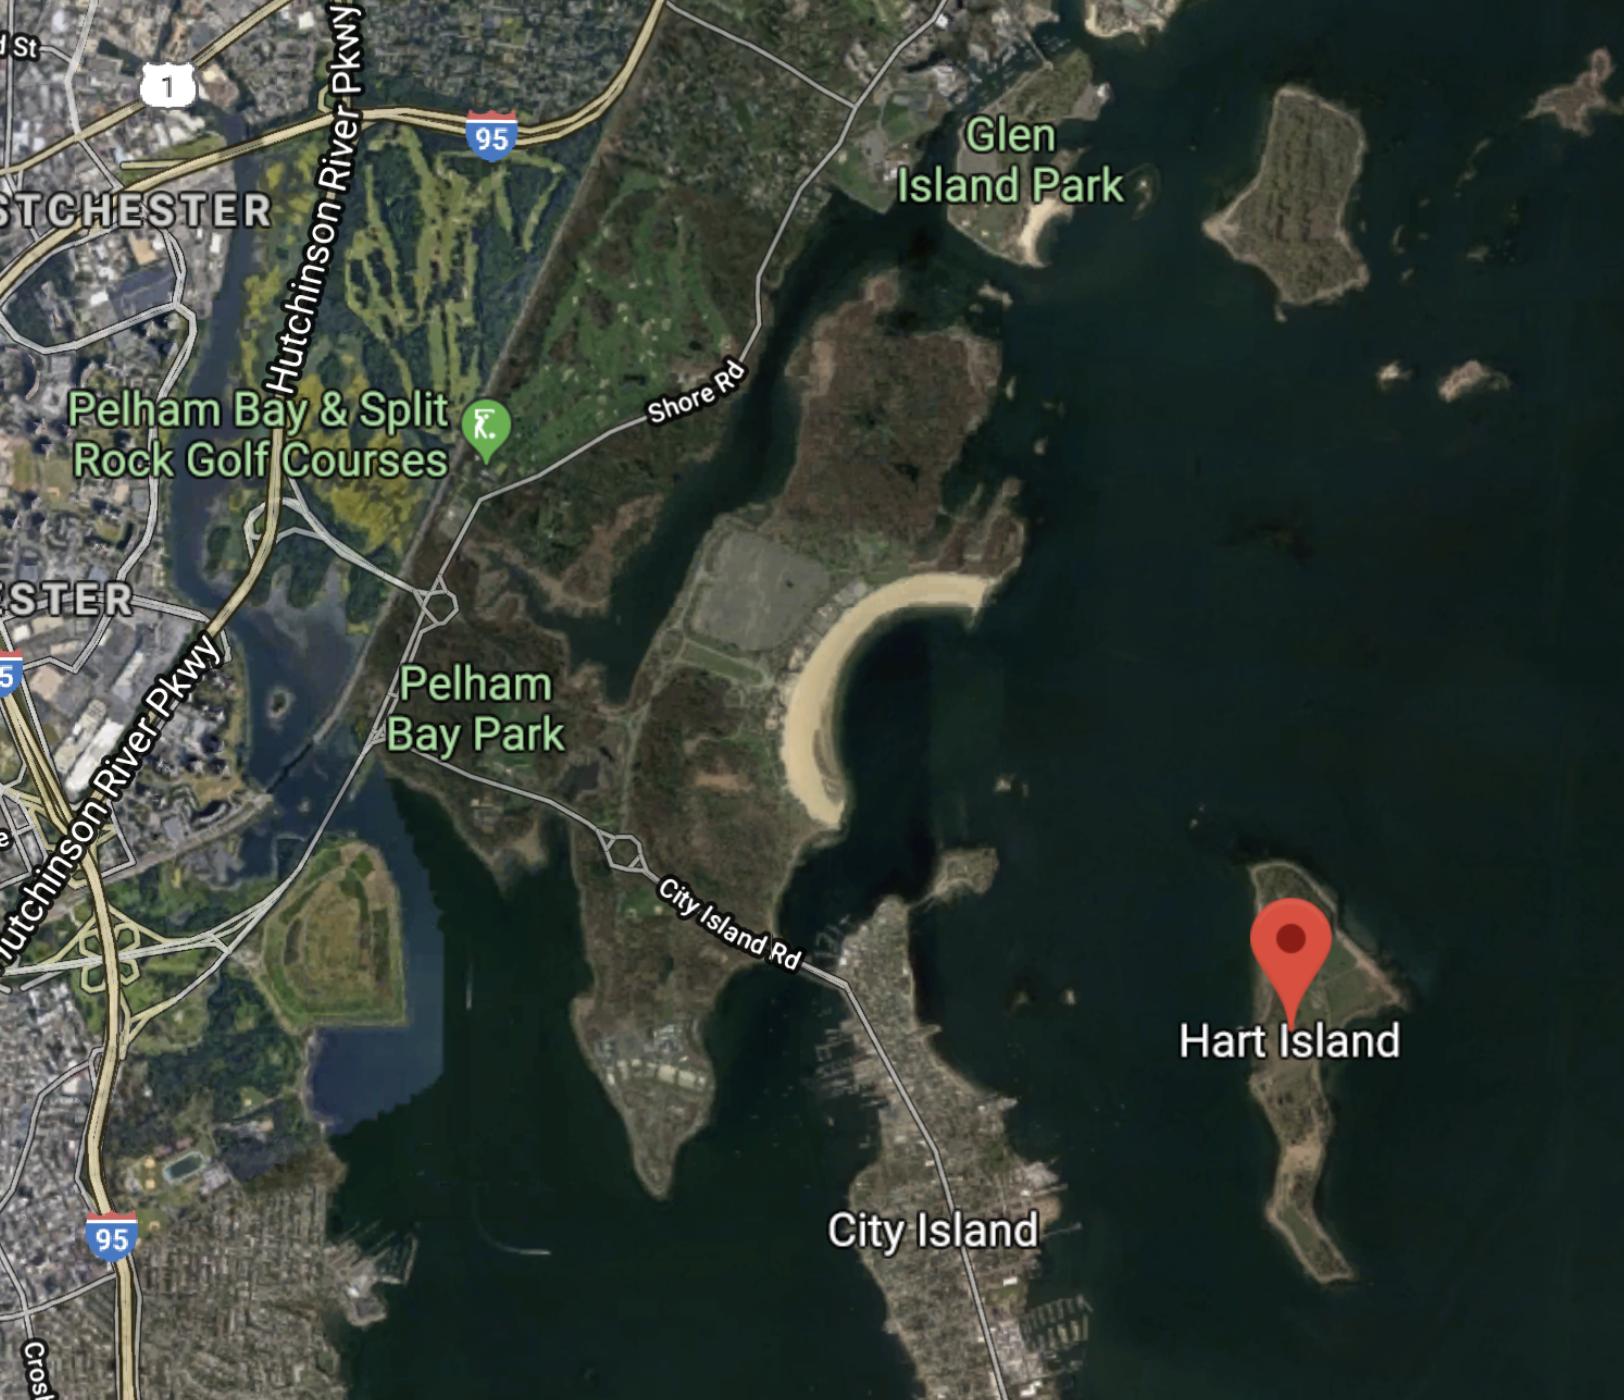 Hart Island satellite image.